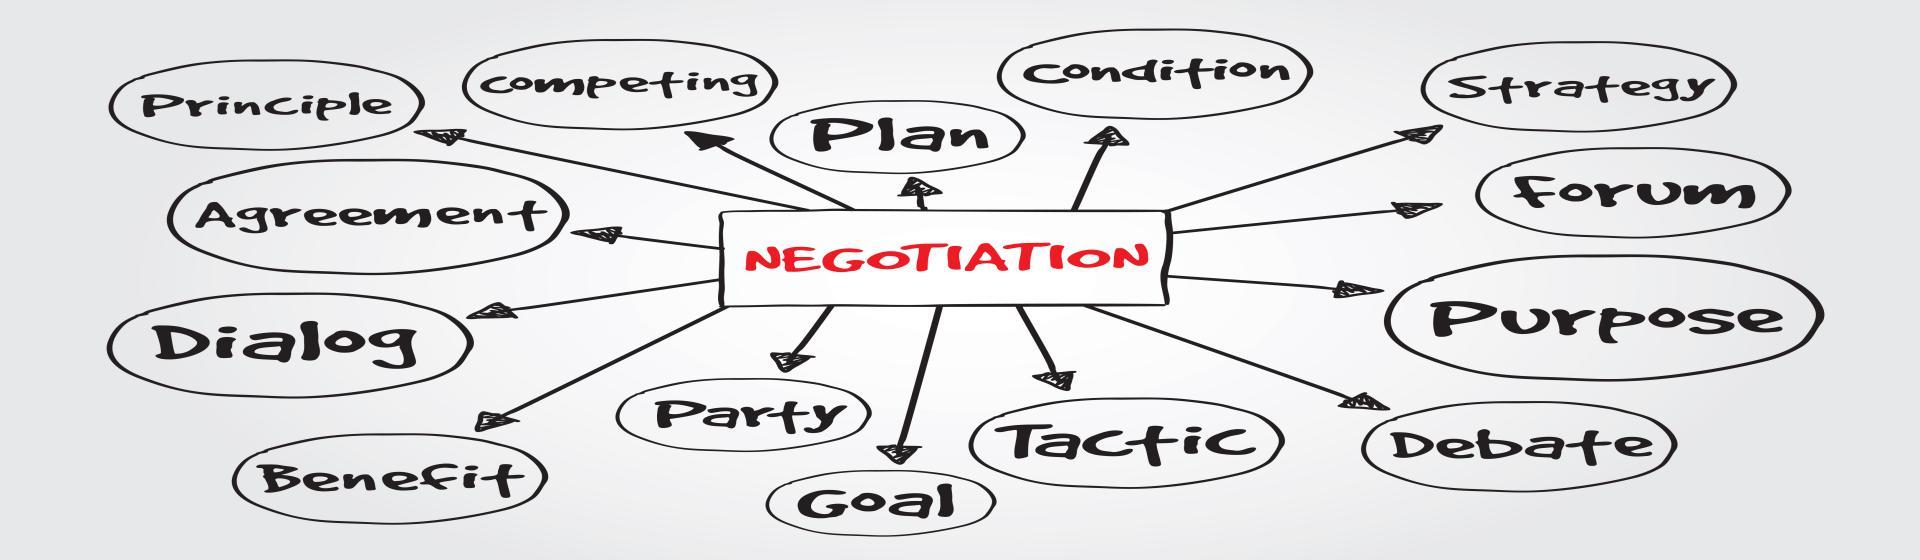 Negotiation%20iv